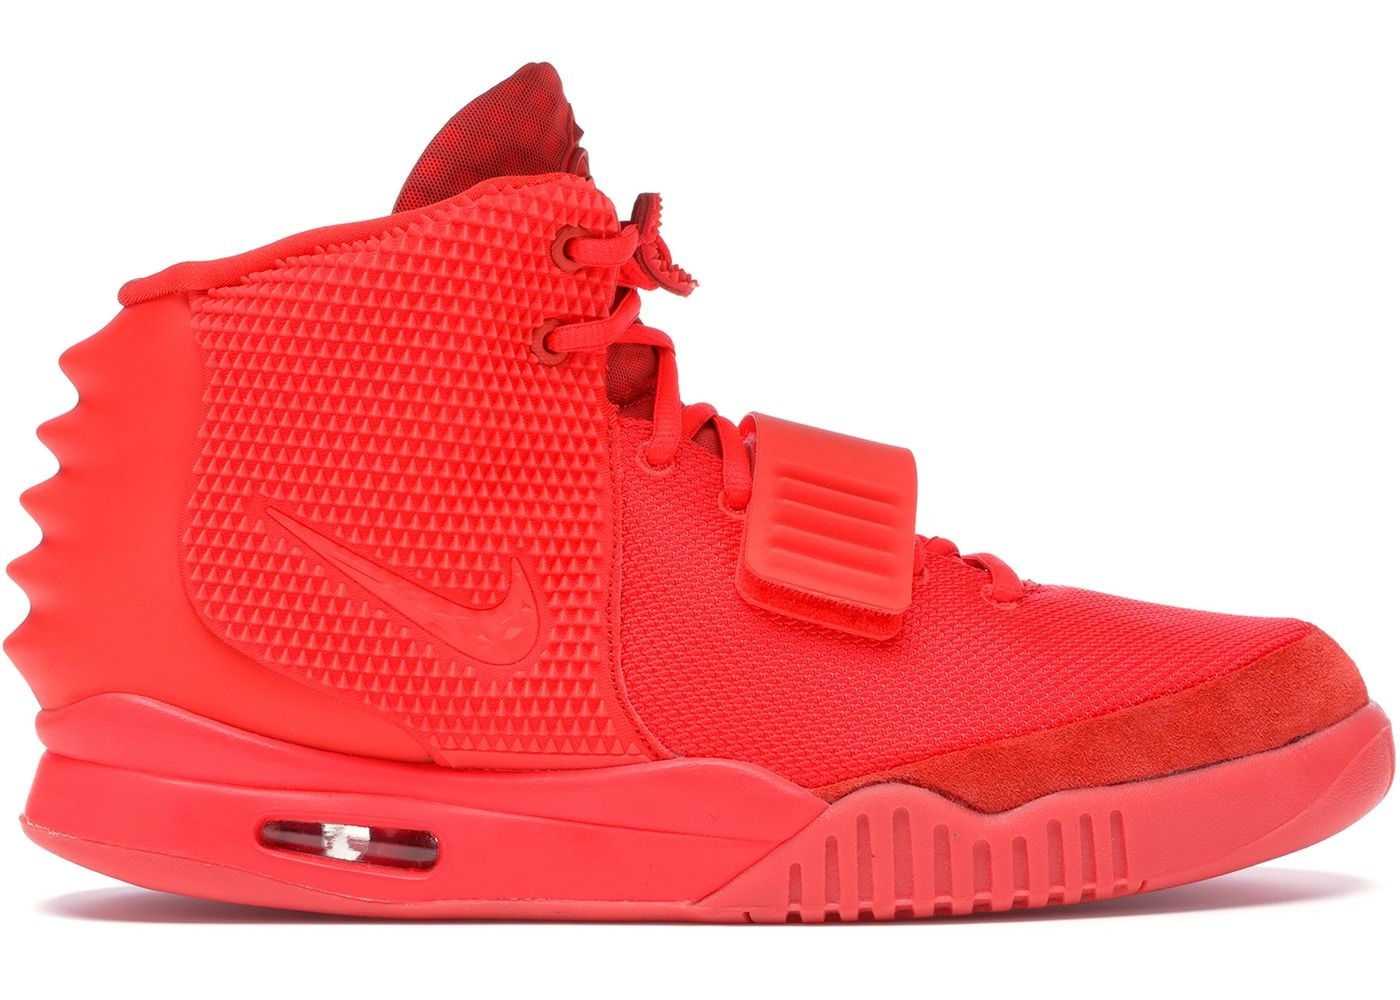 Nike Air Yeezy 2 Red October in 2020